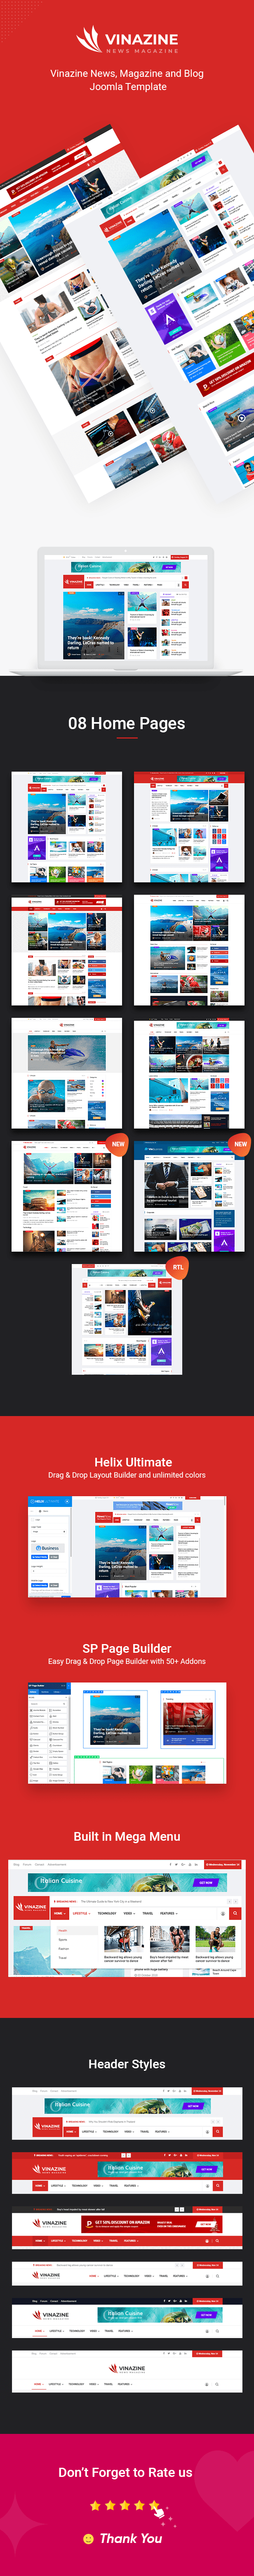 Vinazine Joomla News Magazine Template Magazine Template Joomla News Magazines